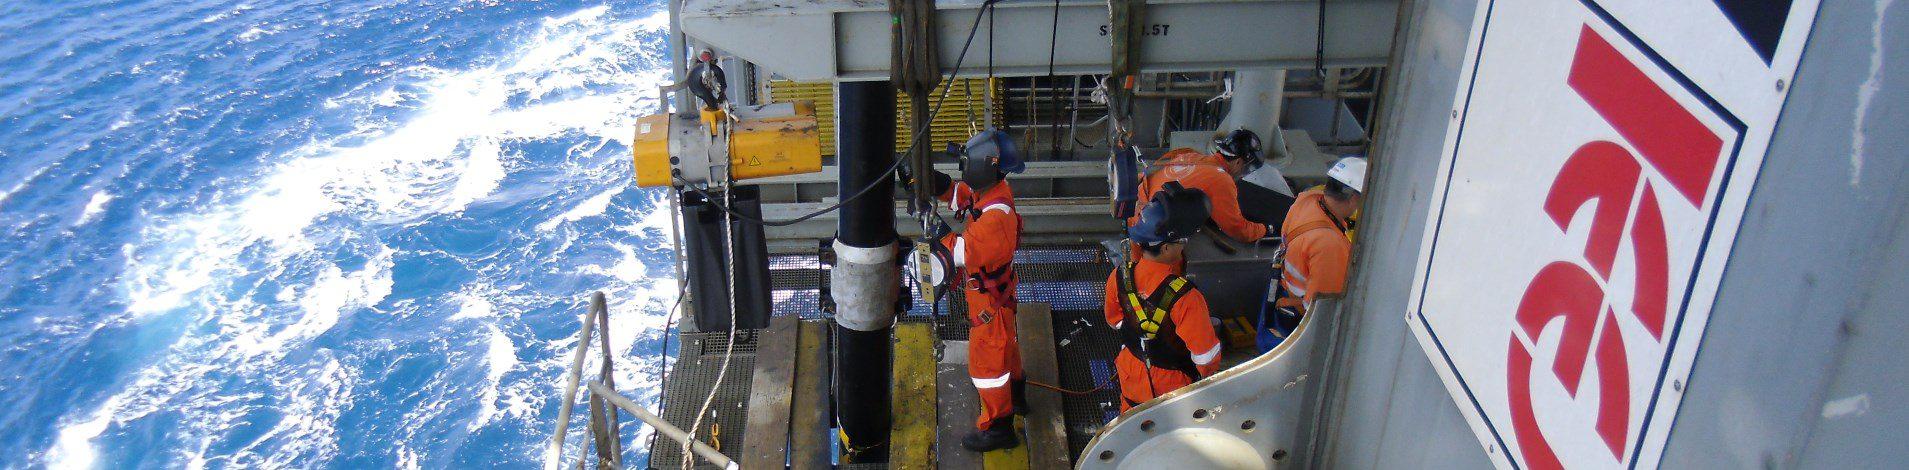 Offshore maintenance activity